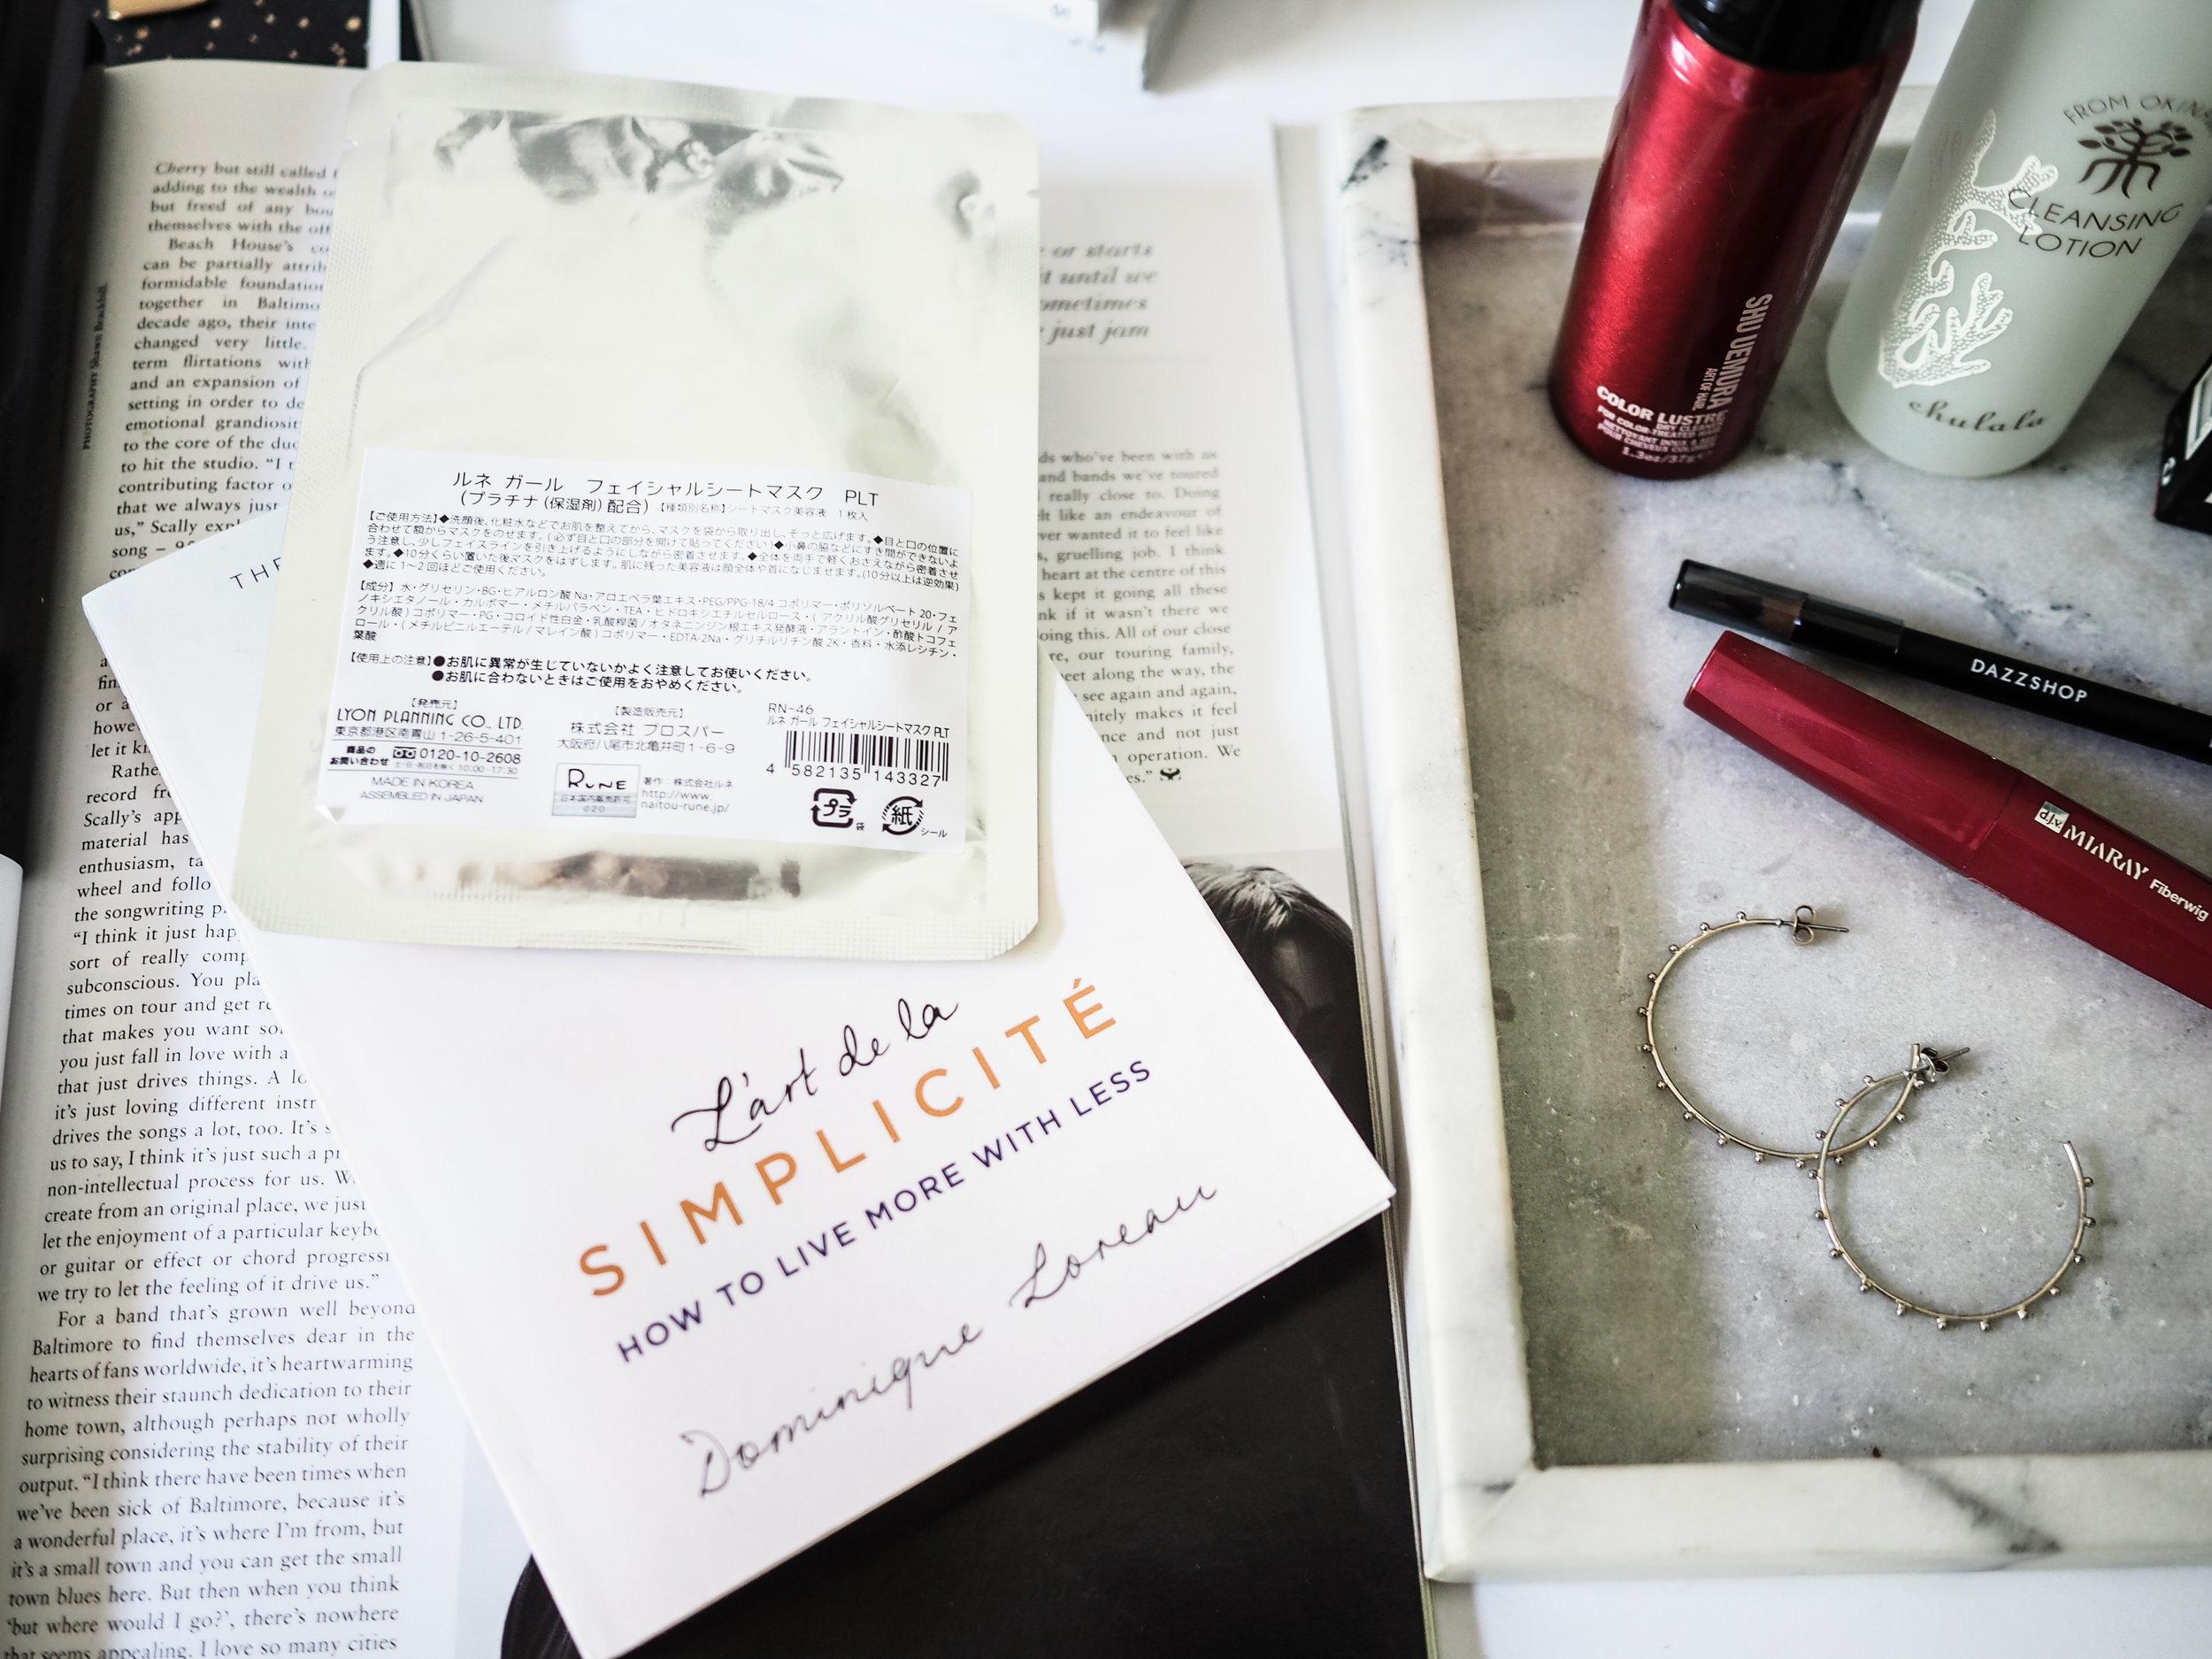 What I'm reading atm.. - L'art de la Simplicité by Dominique Loreau / An insightful read into minimalism inspired by Japanese principles.